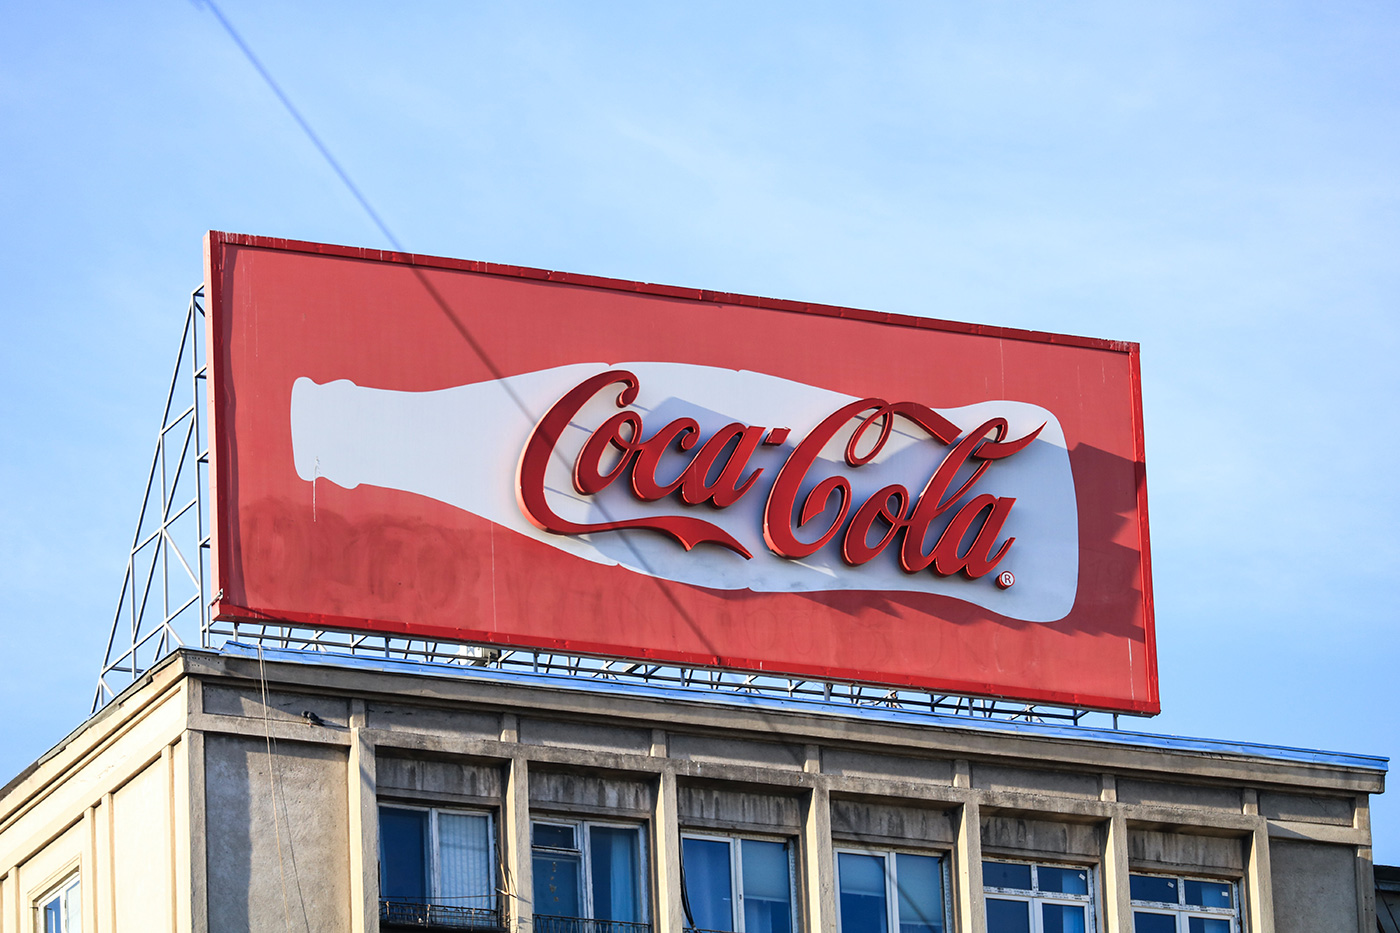 Coca-Cola logo billboard